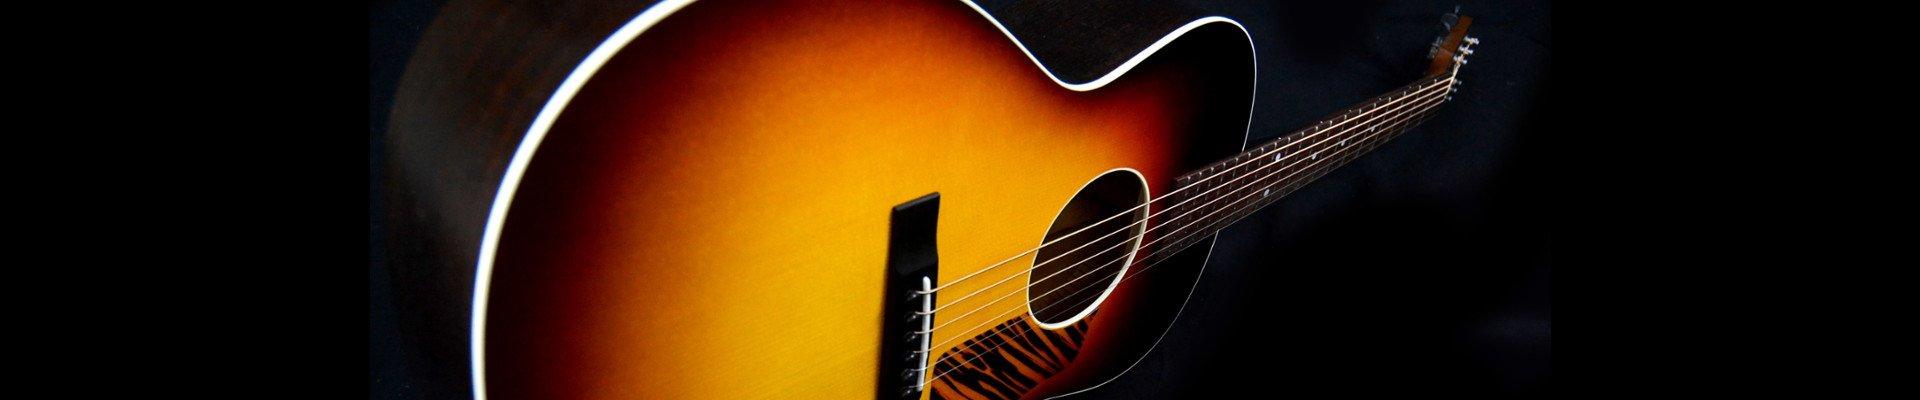 Waterloo Guitars Banner